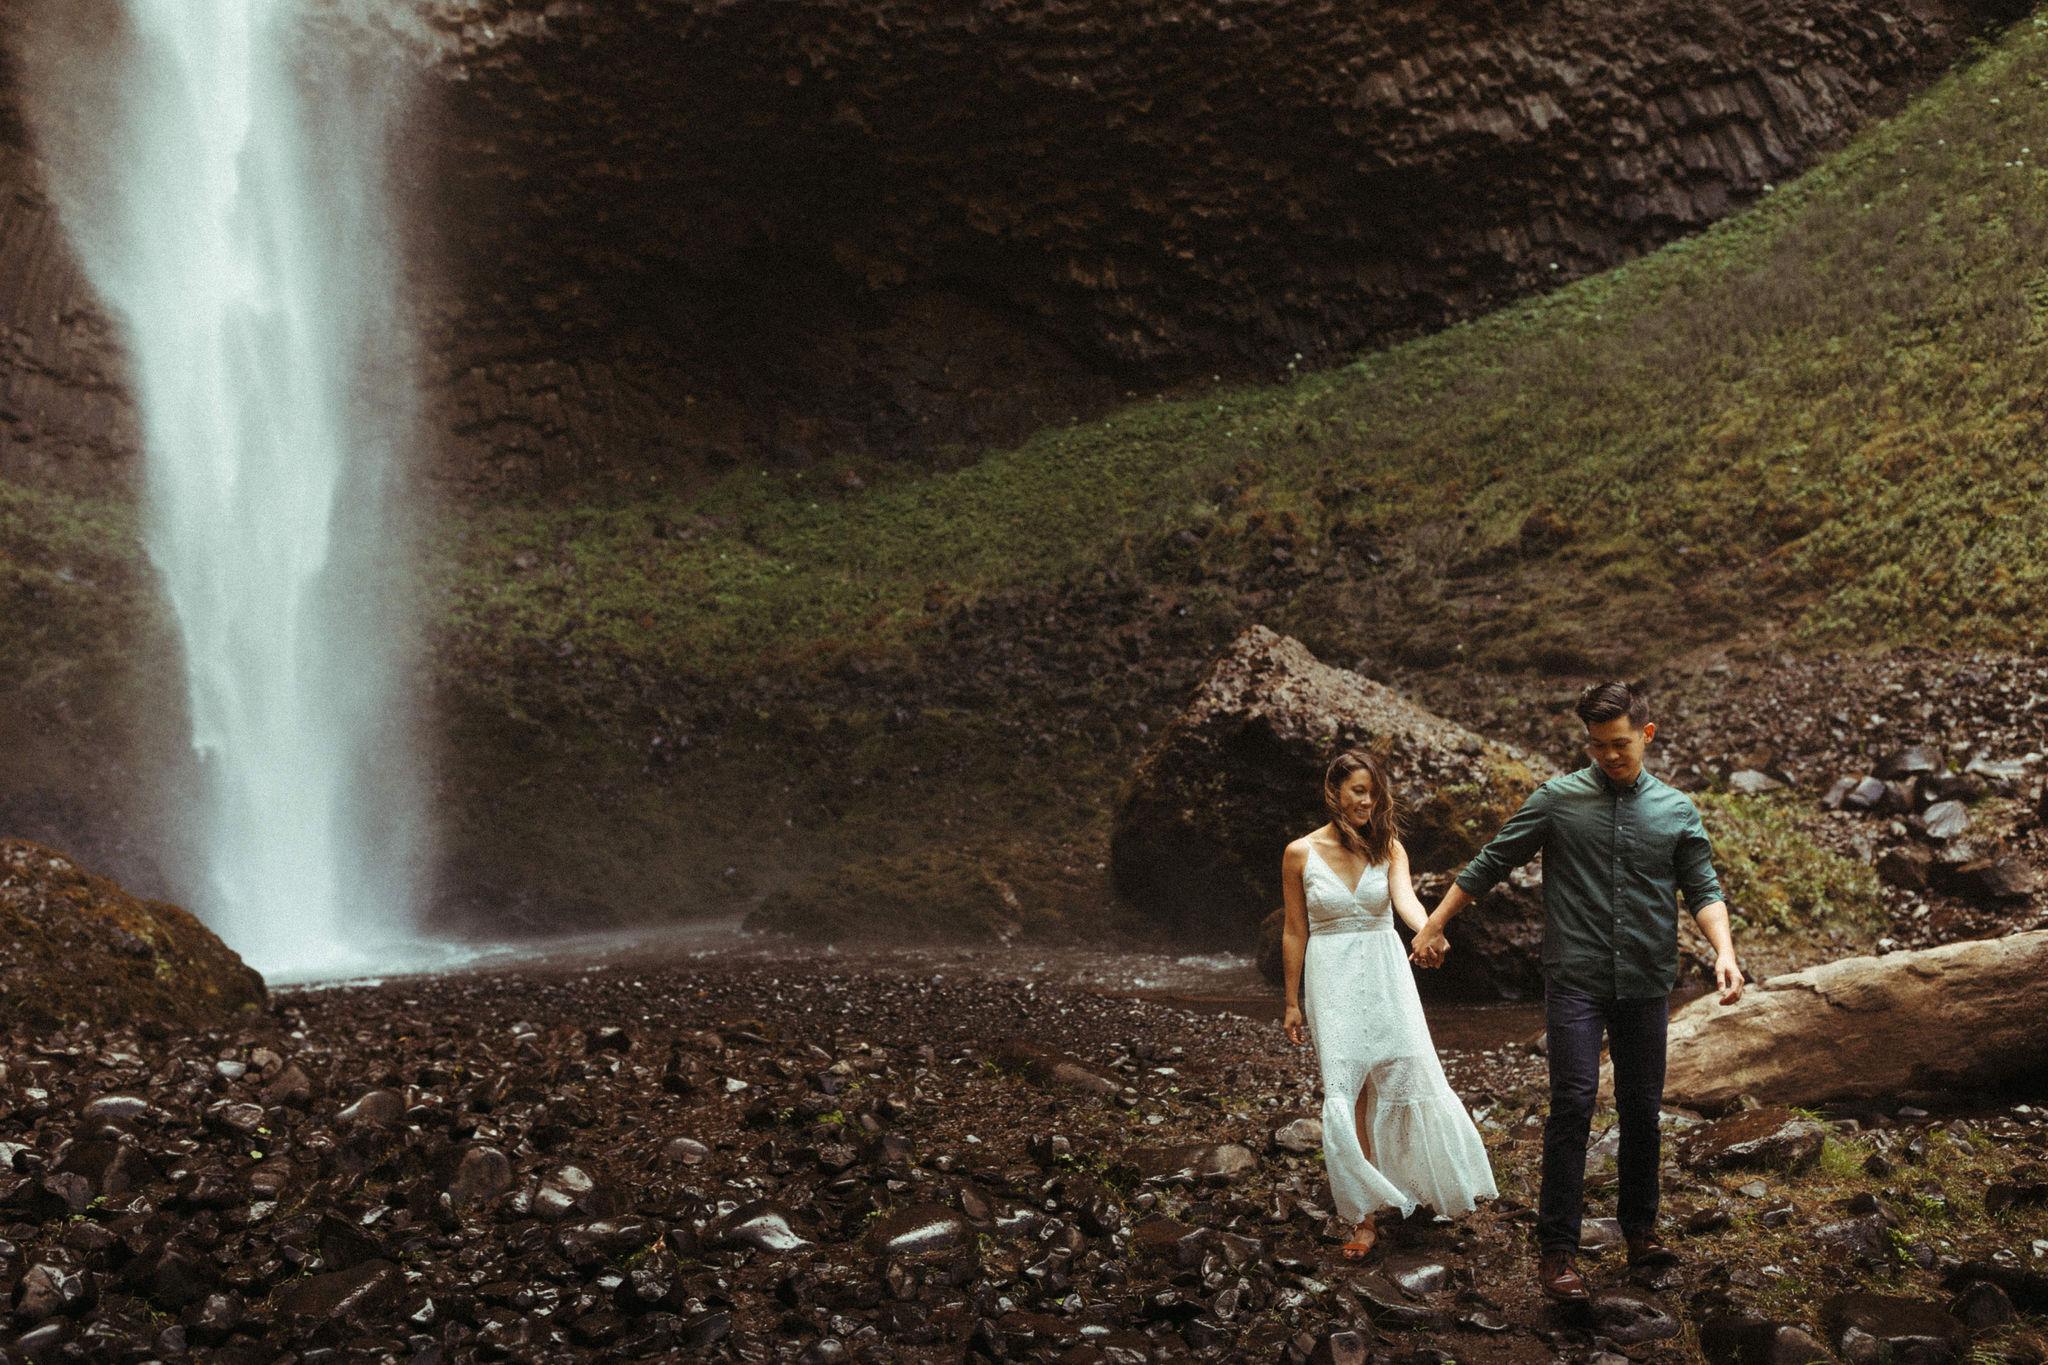 oregon waterfall adventure engagement